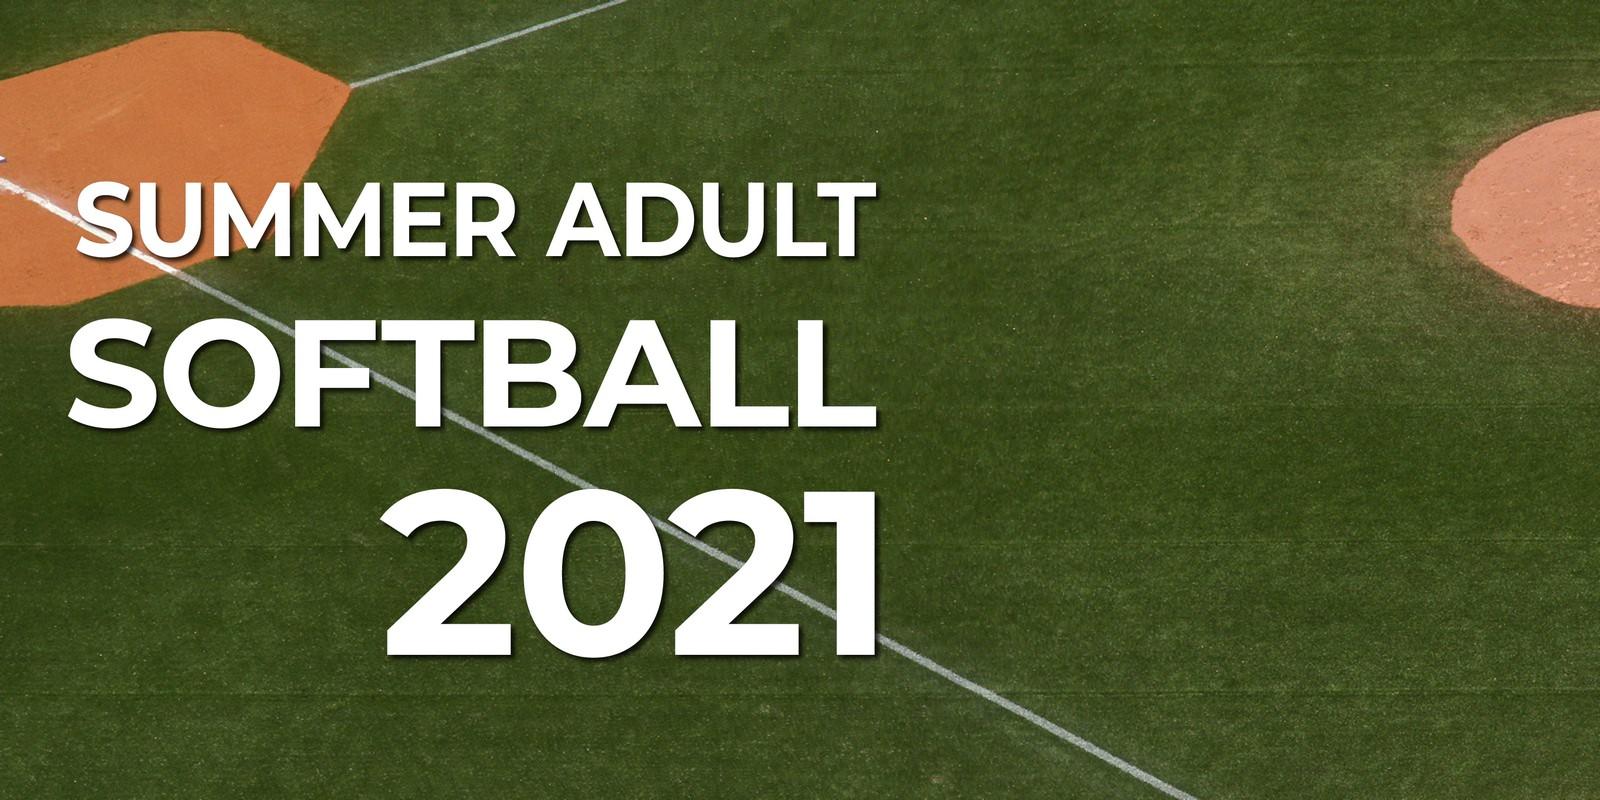 2021 Summer Adult Softball